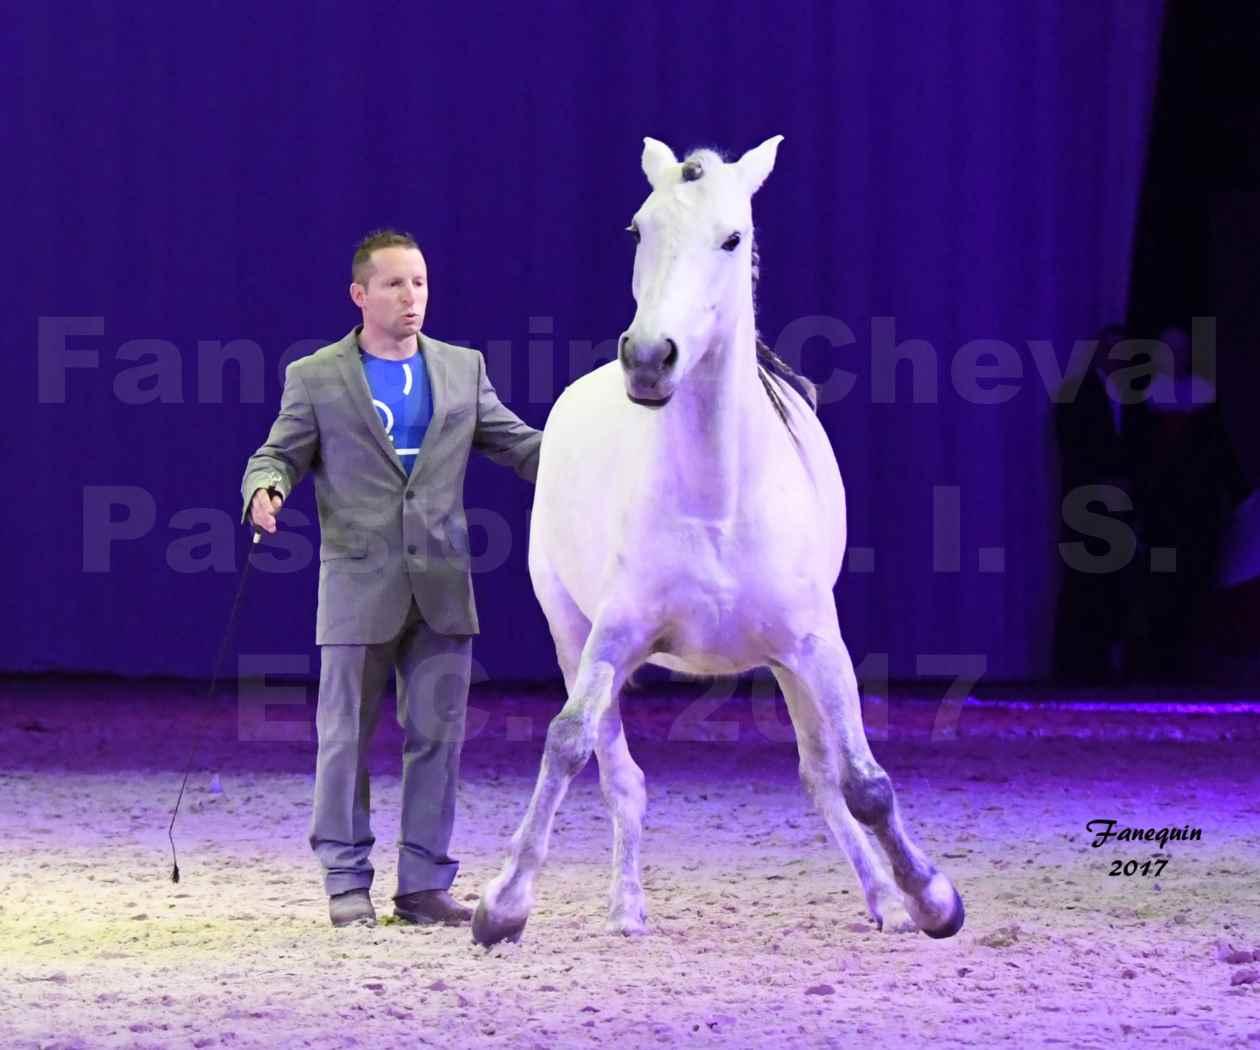 Cheval Passion 2017 - M. I. S. E. C. - Ludovic LONGO & 1 cheval en liberté - 08